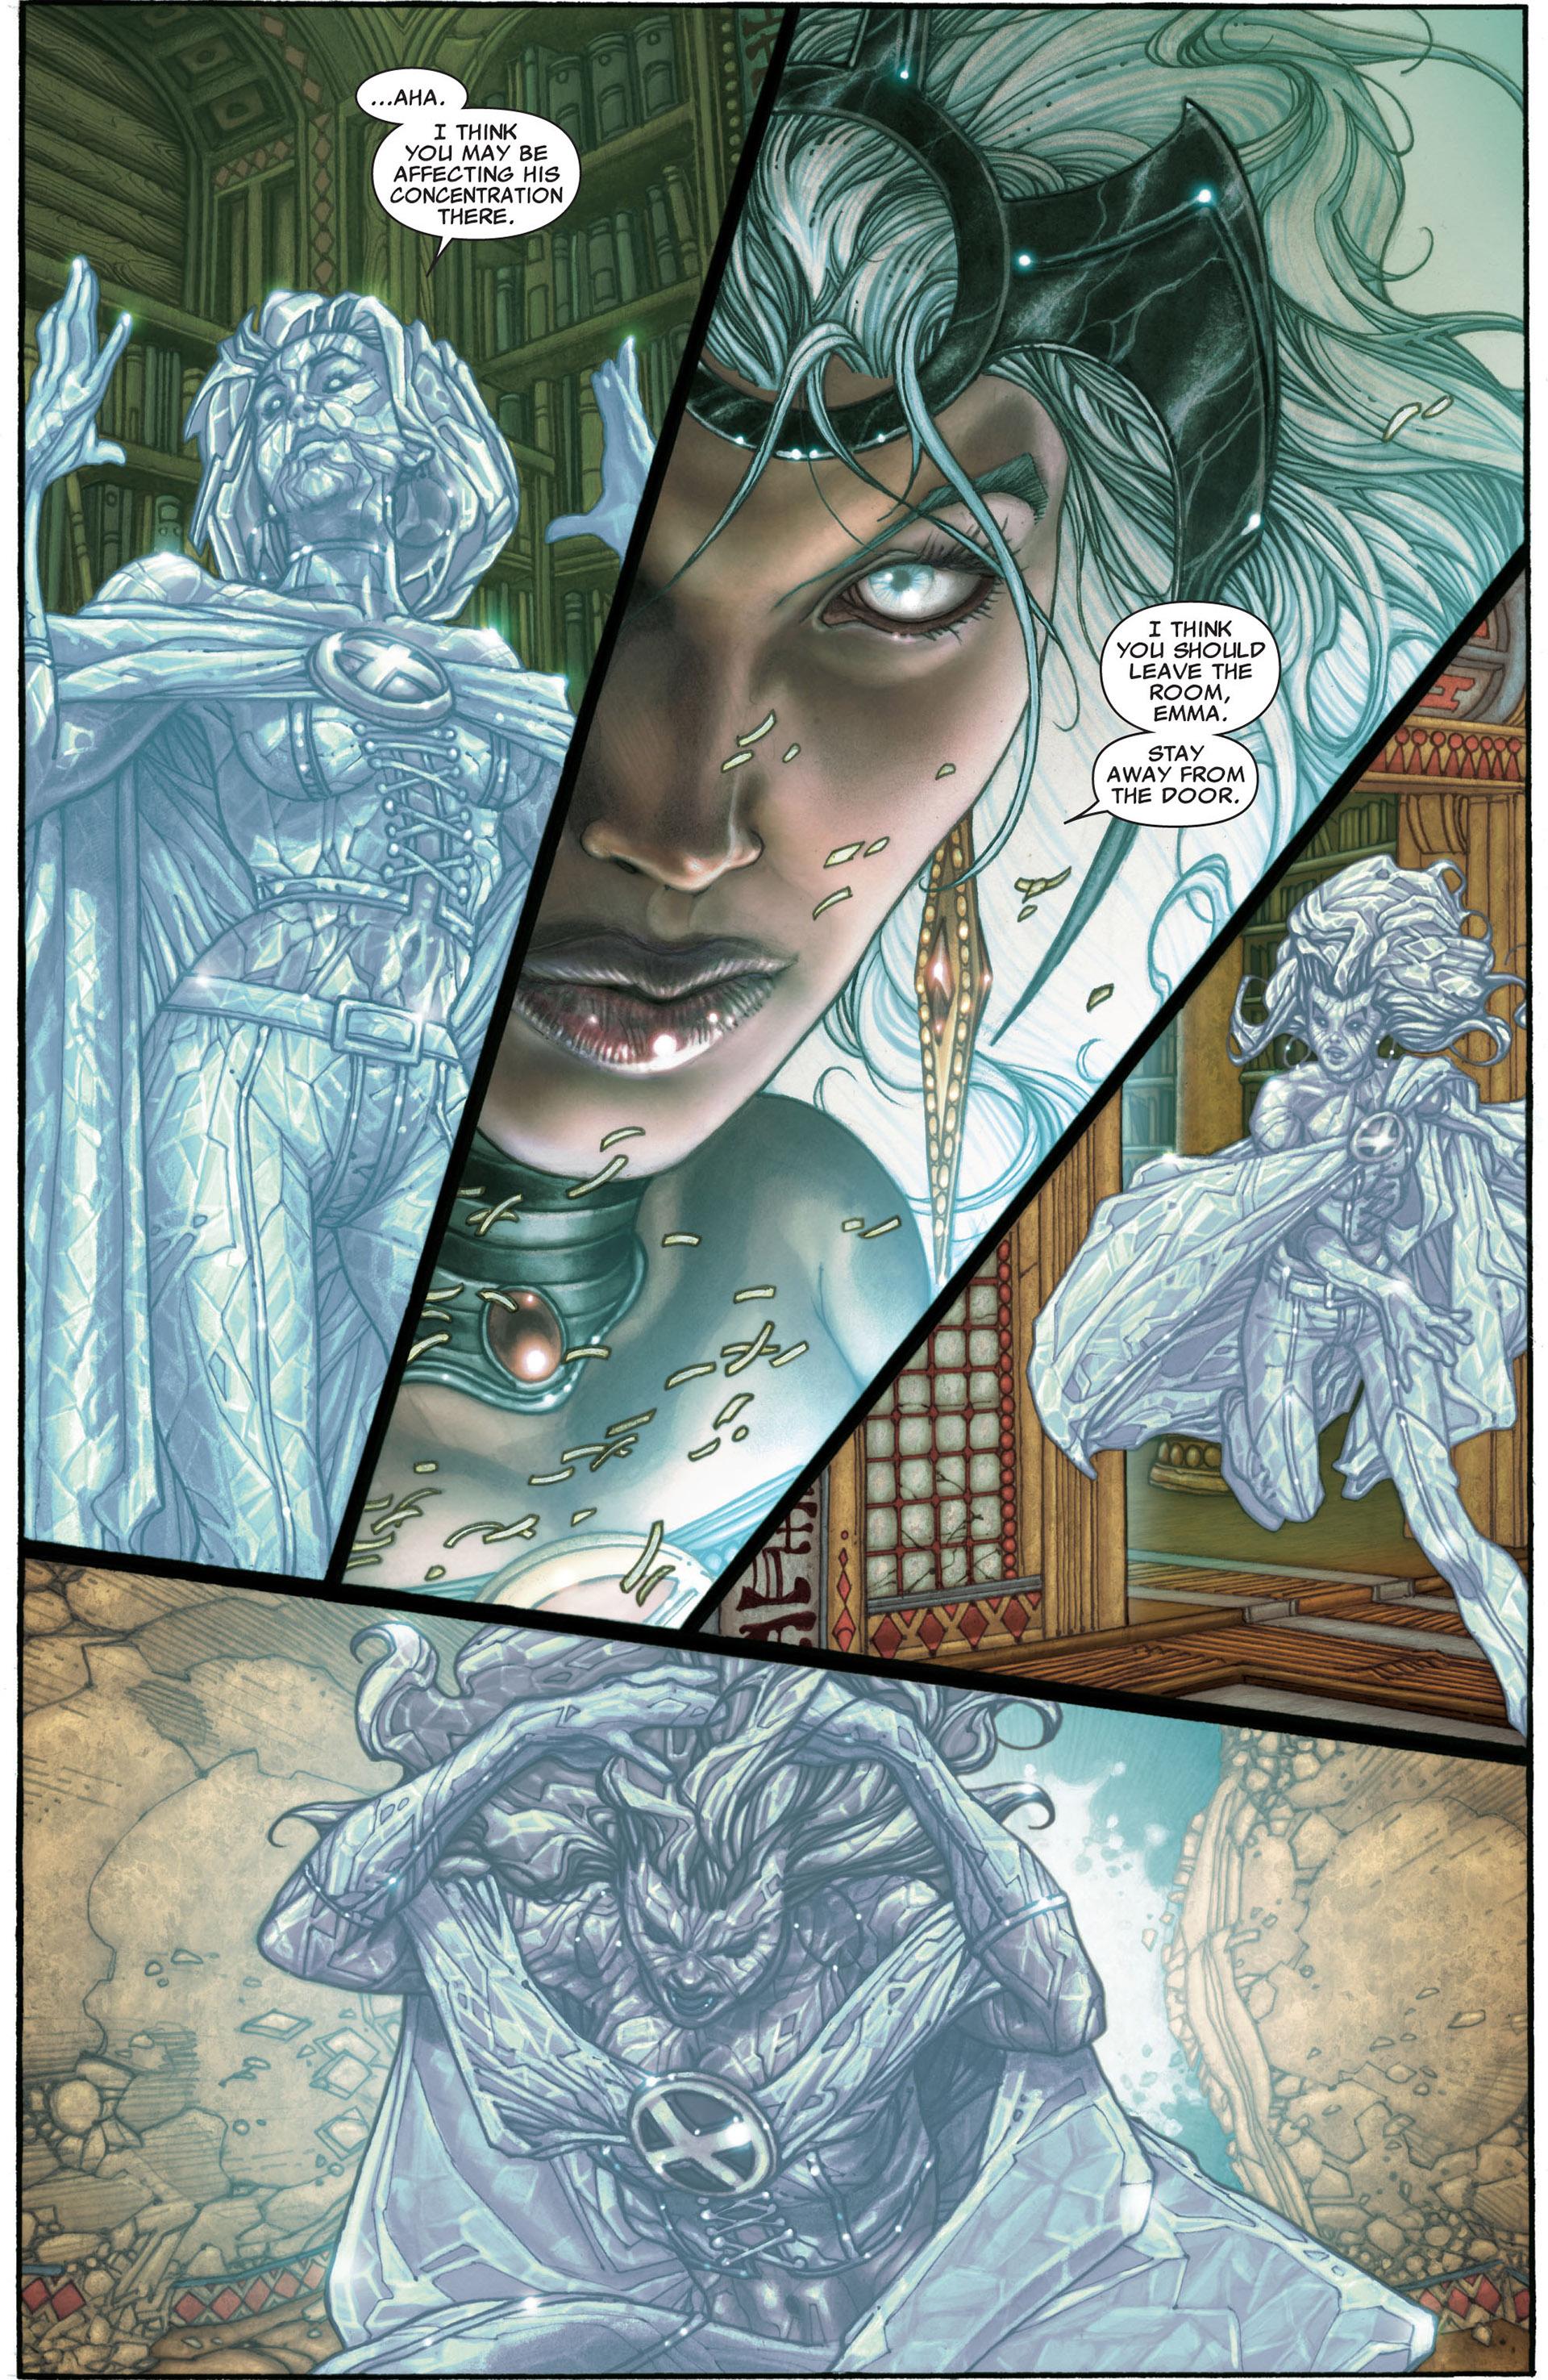 Read online Astonishing X-Men (2004) comic -  Issue #29 - 11